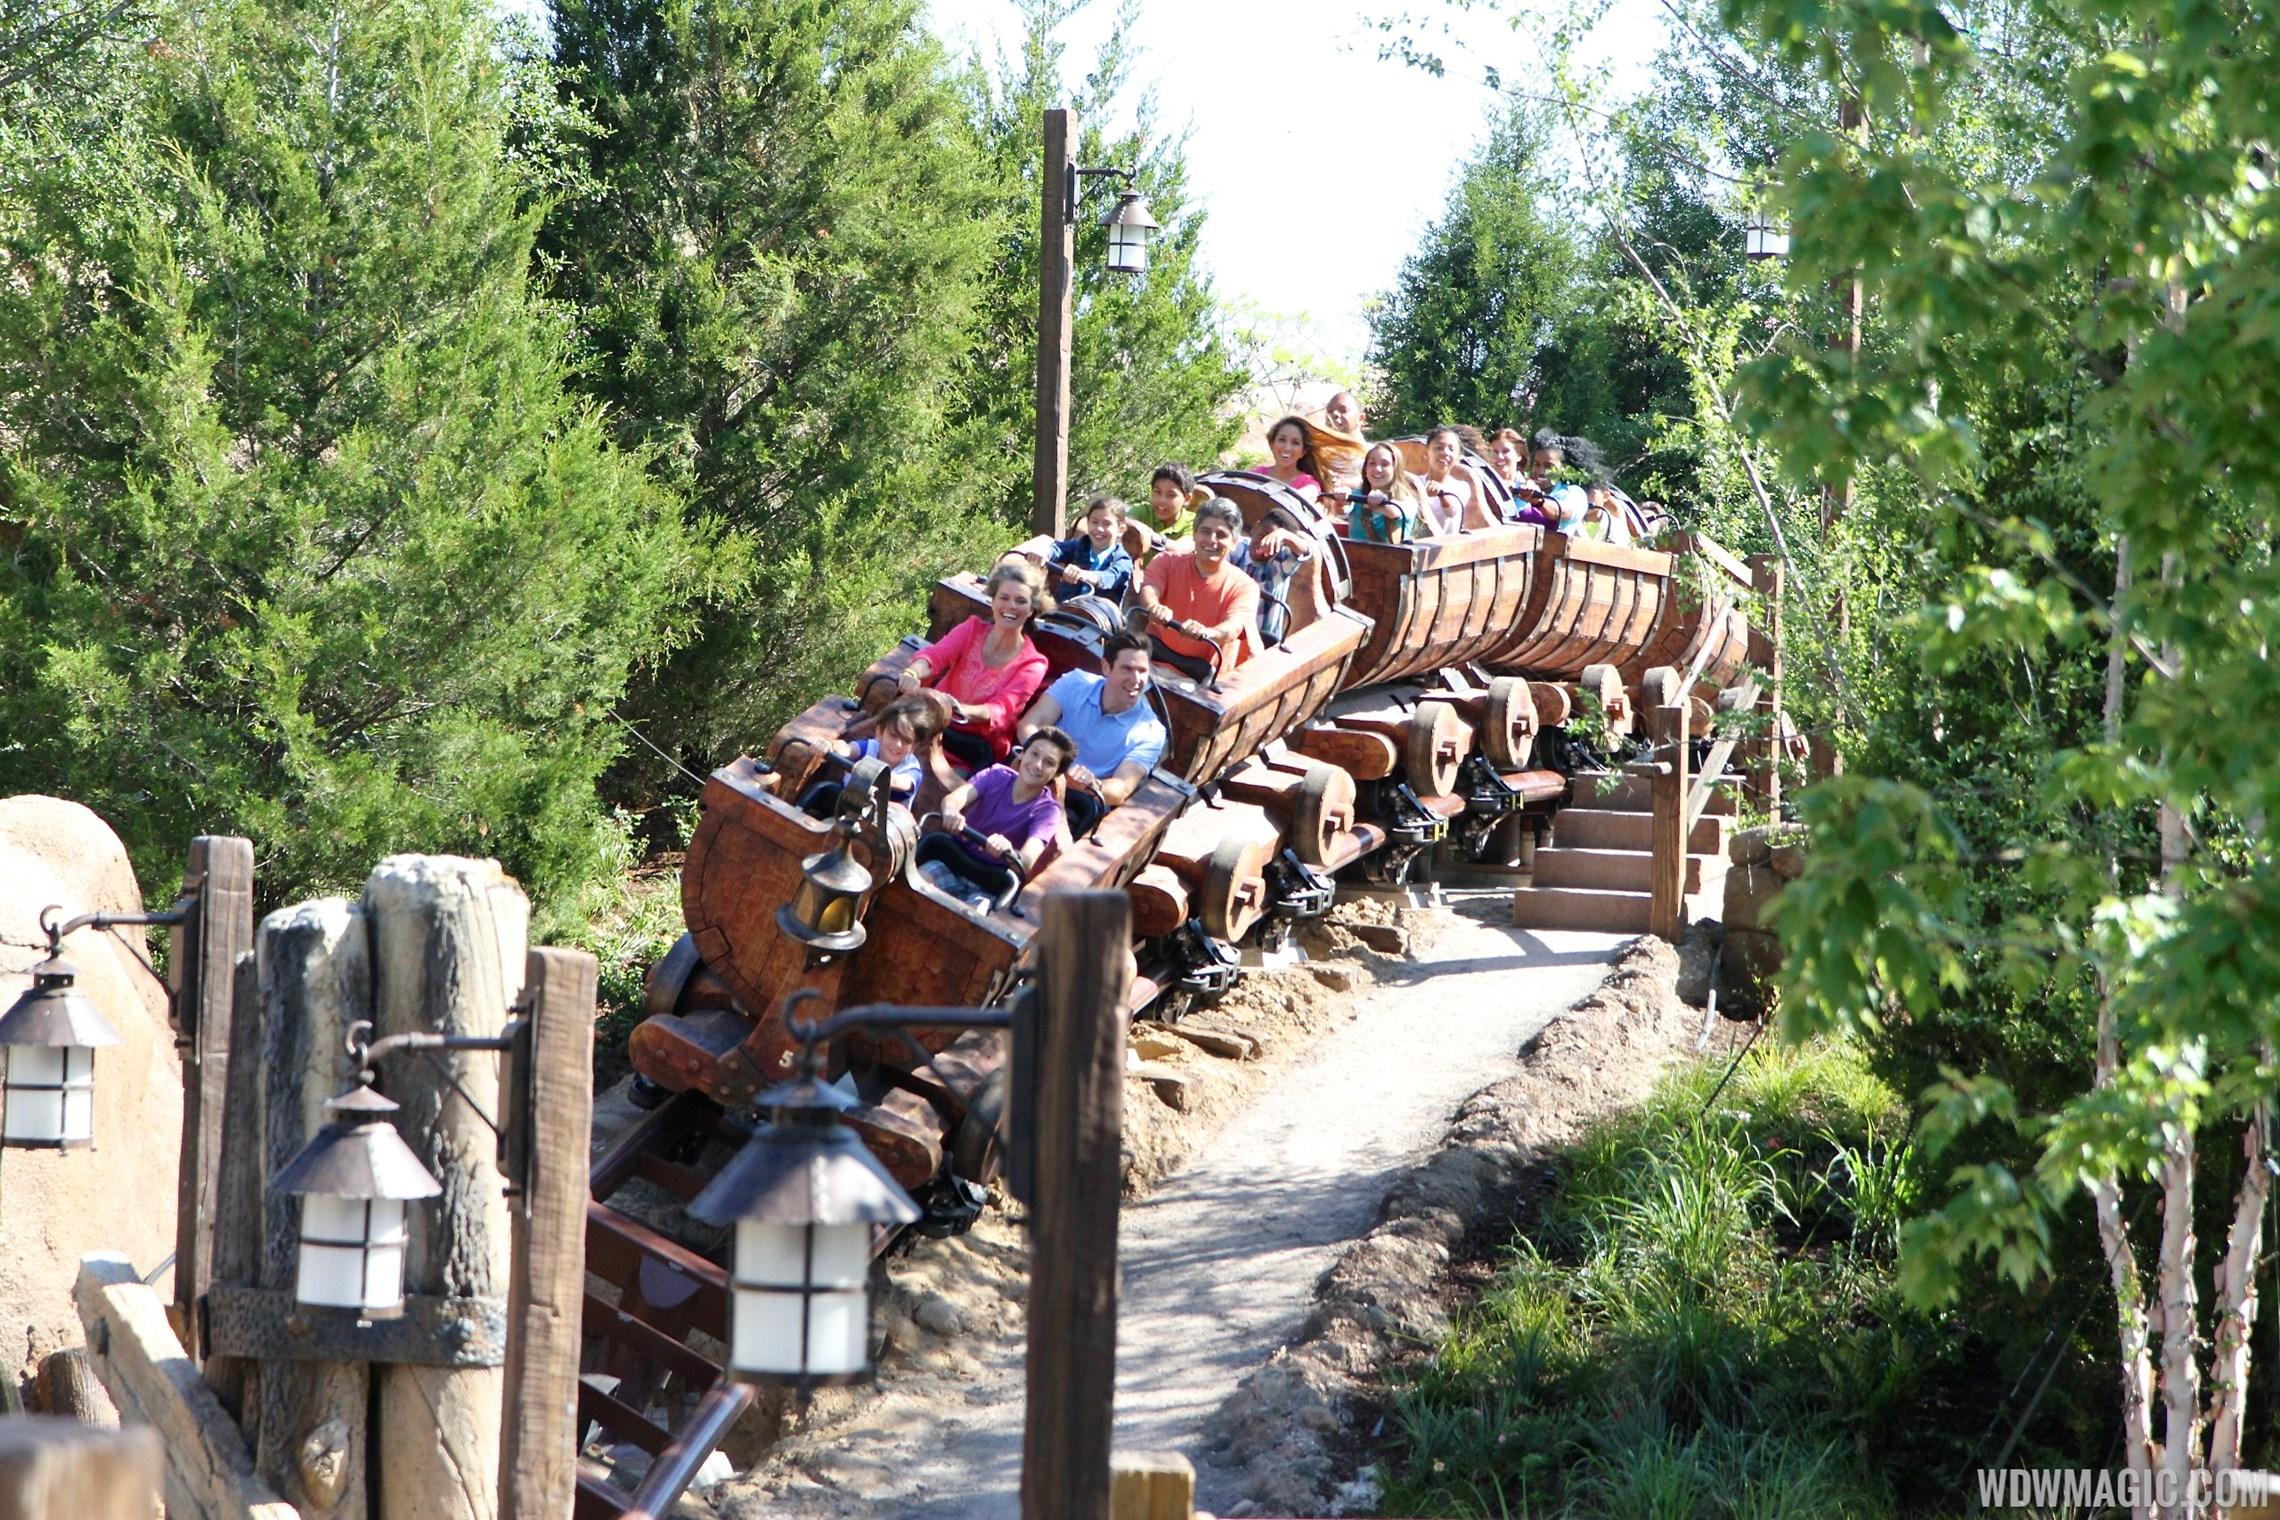 Seven Dwarfs Mine Train commercial filming